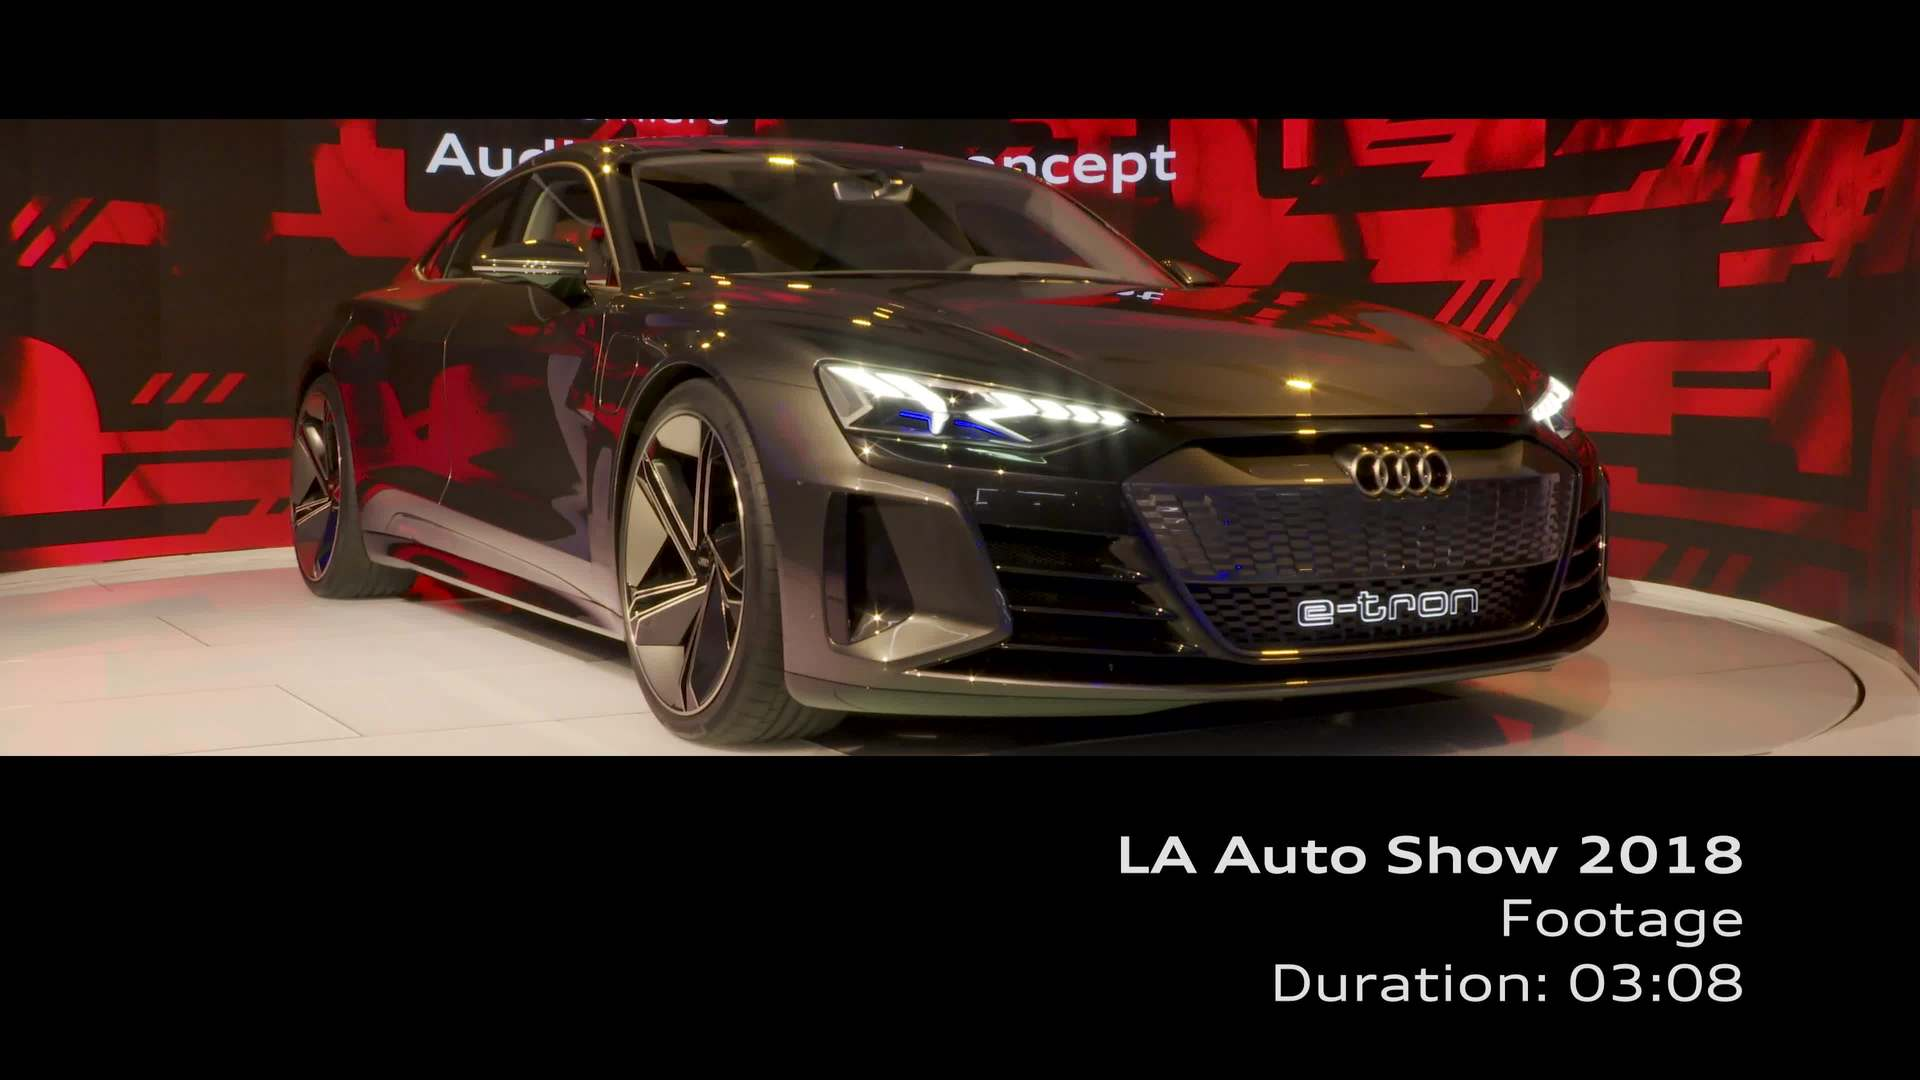 L.A. Auto Show (Footage)